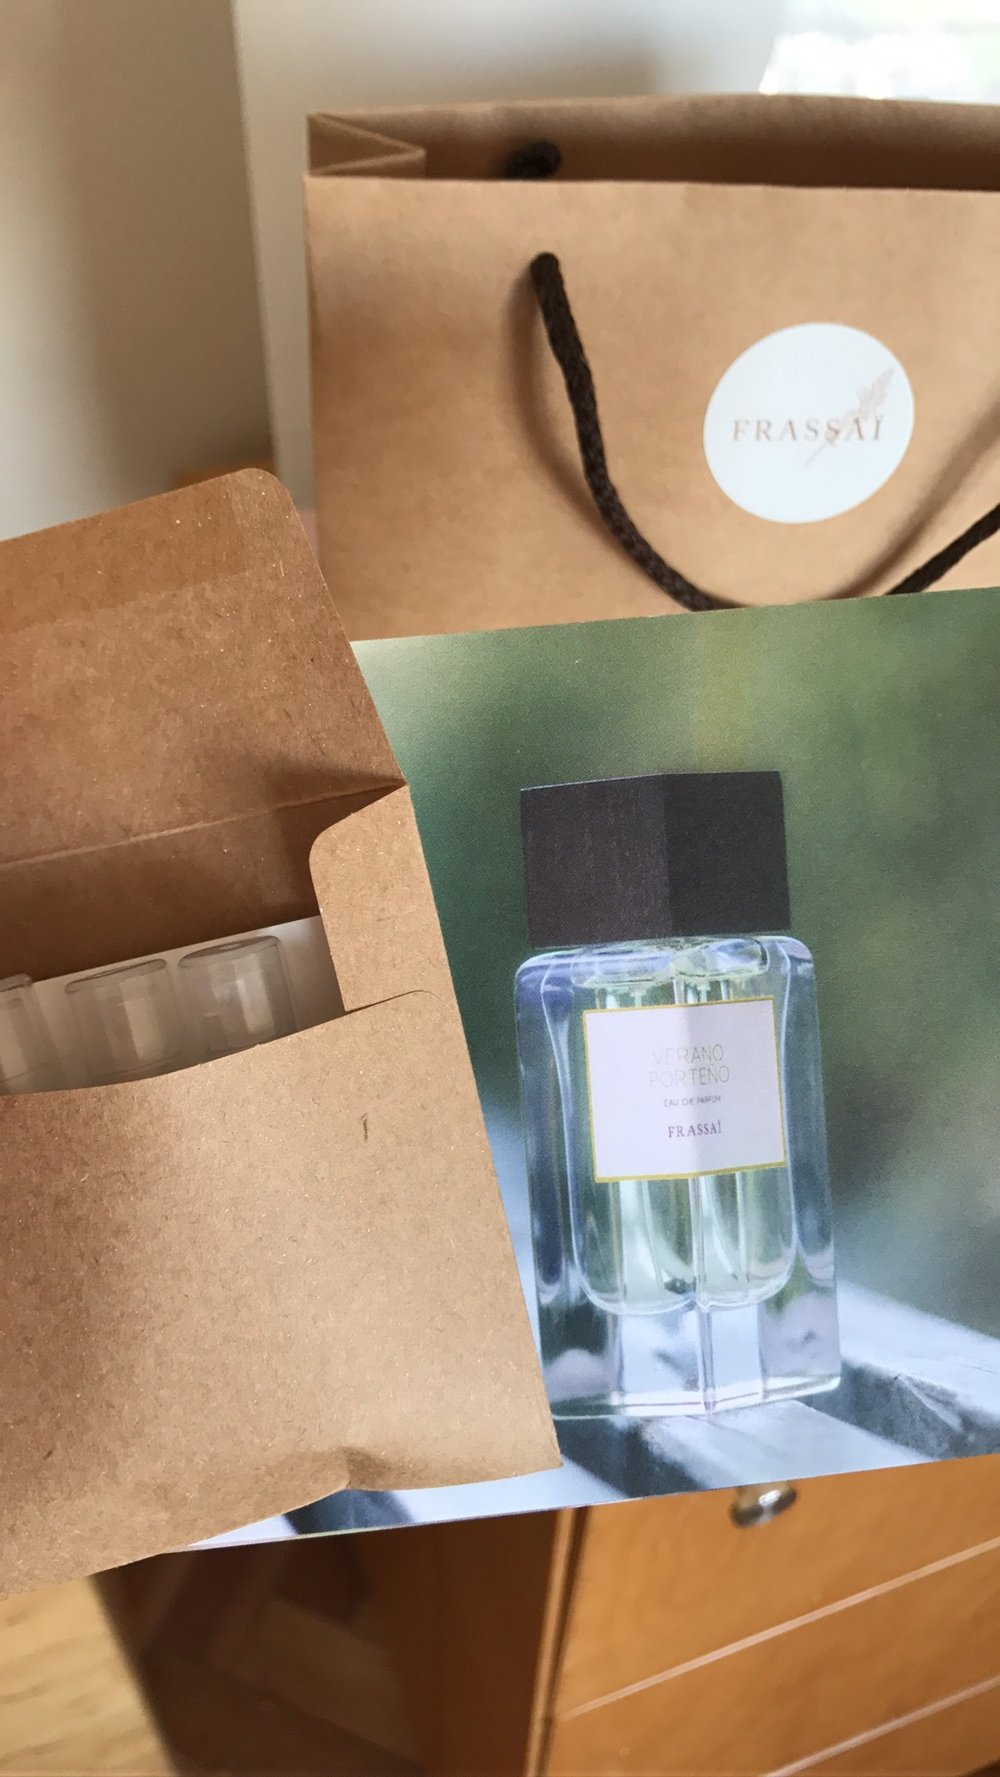 Frassai perfume